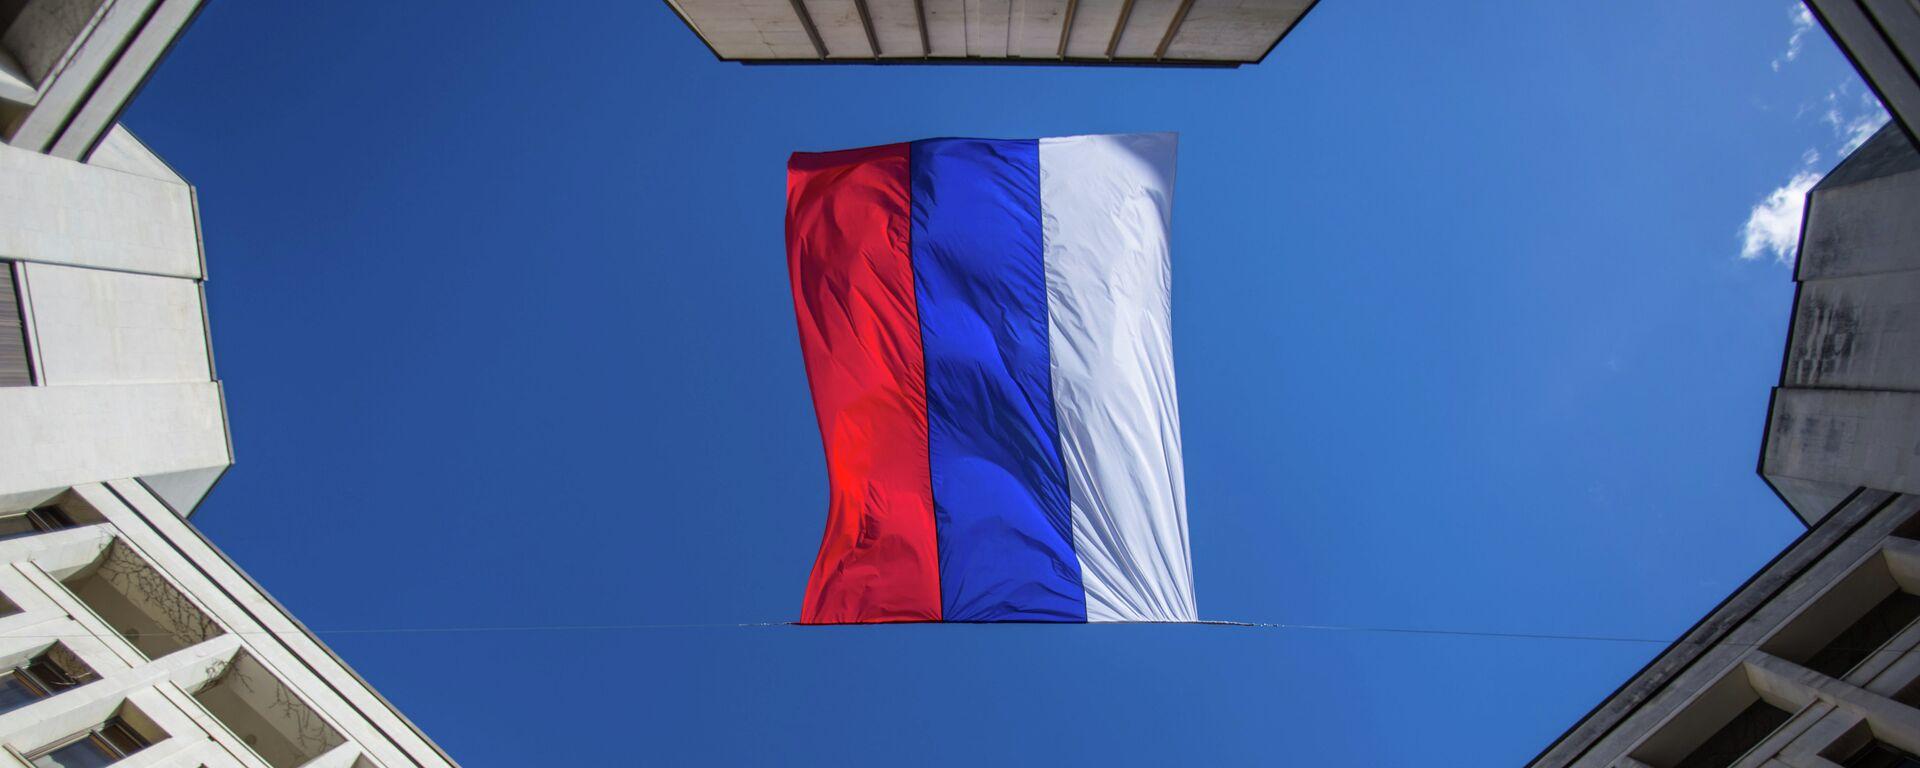 La bandera de Rusia sobre la sede del Consejo Supremo de Crimea - Sputnik Mundo, 1920, 16.03.2021